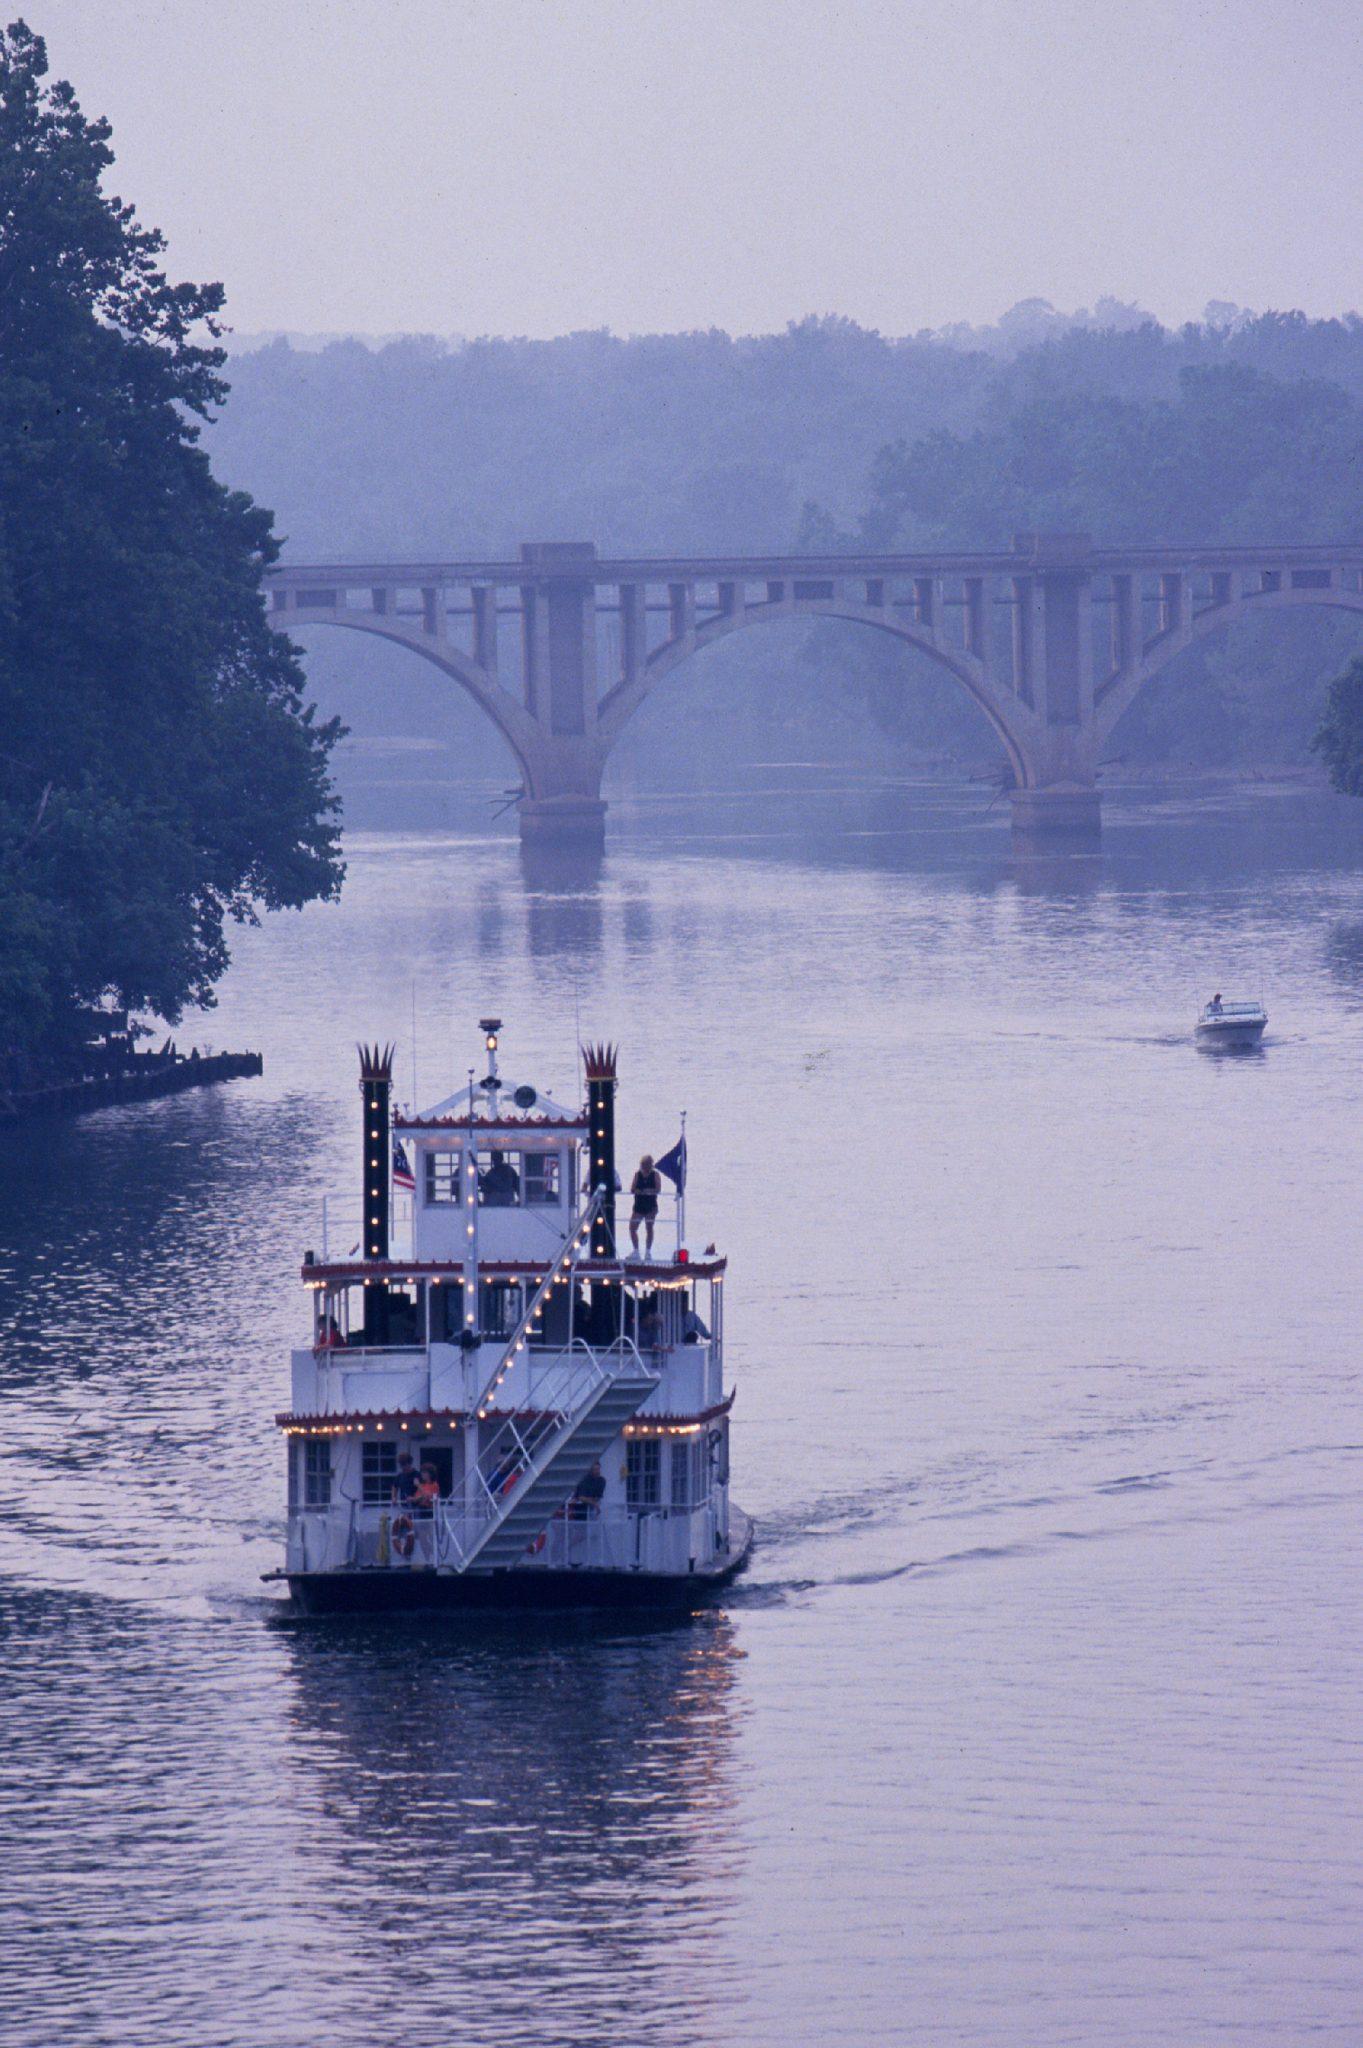 City of Fredericksburg River Cruises